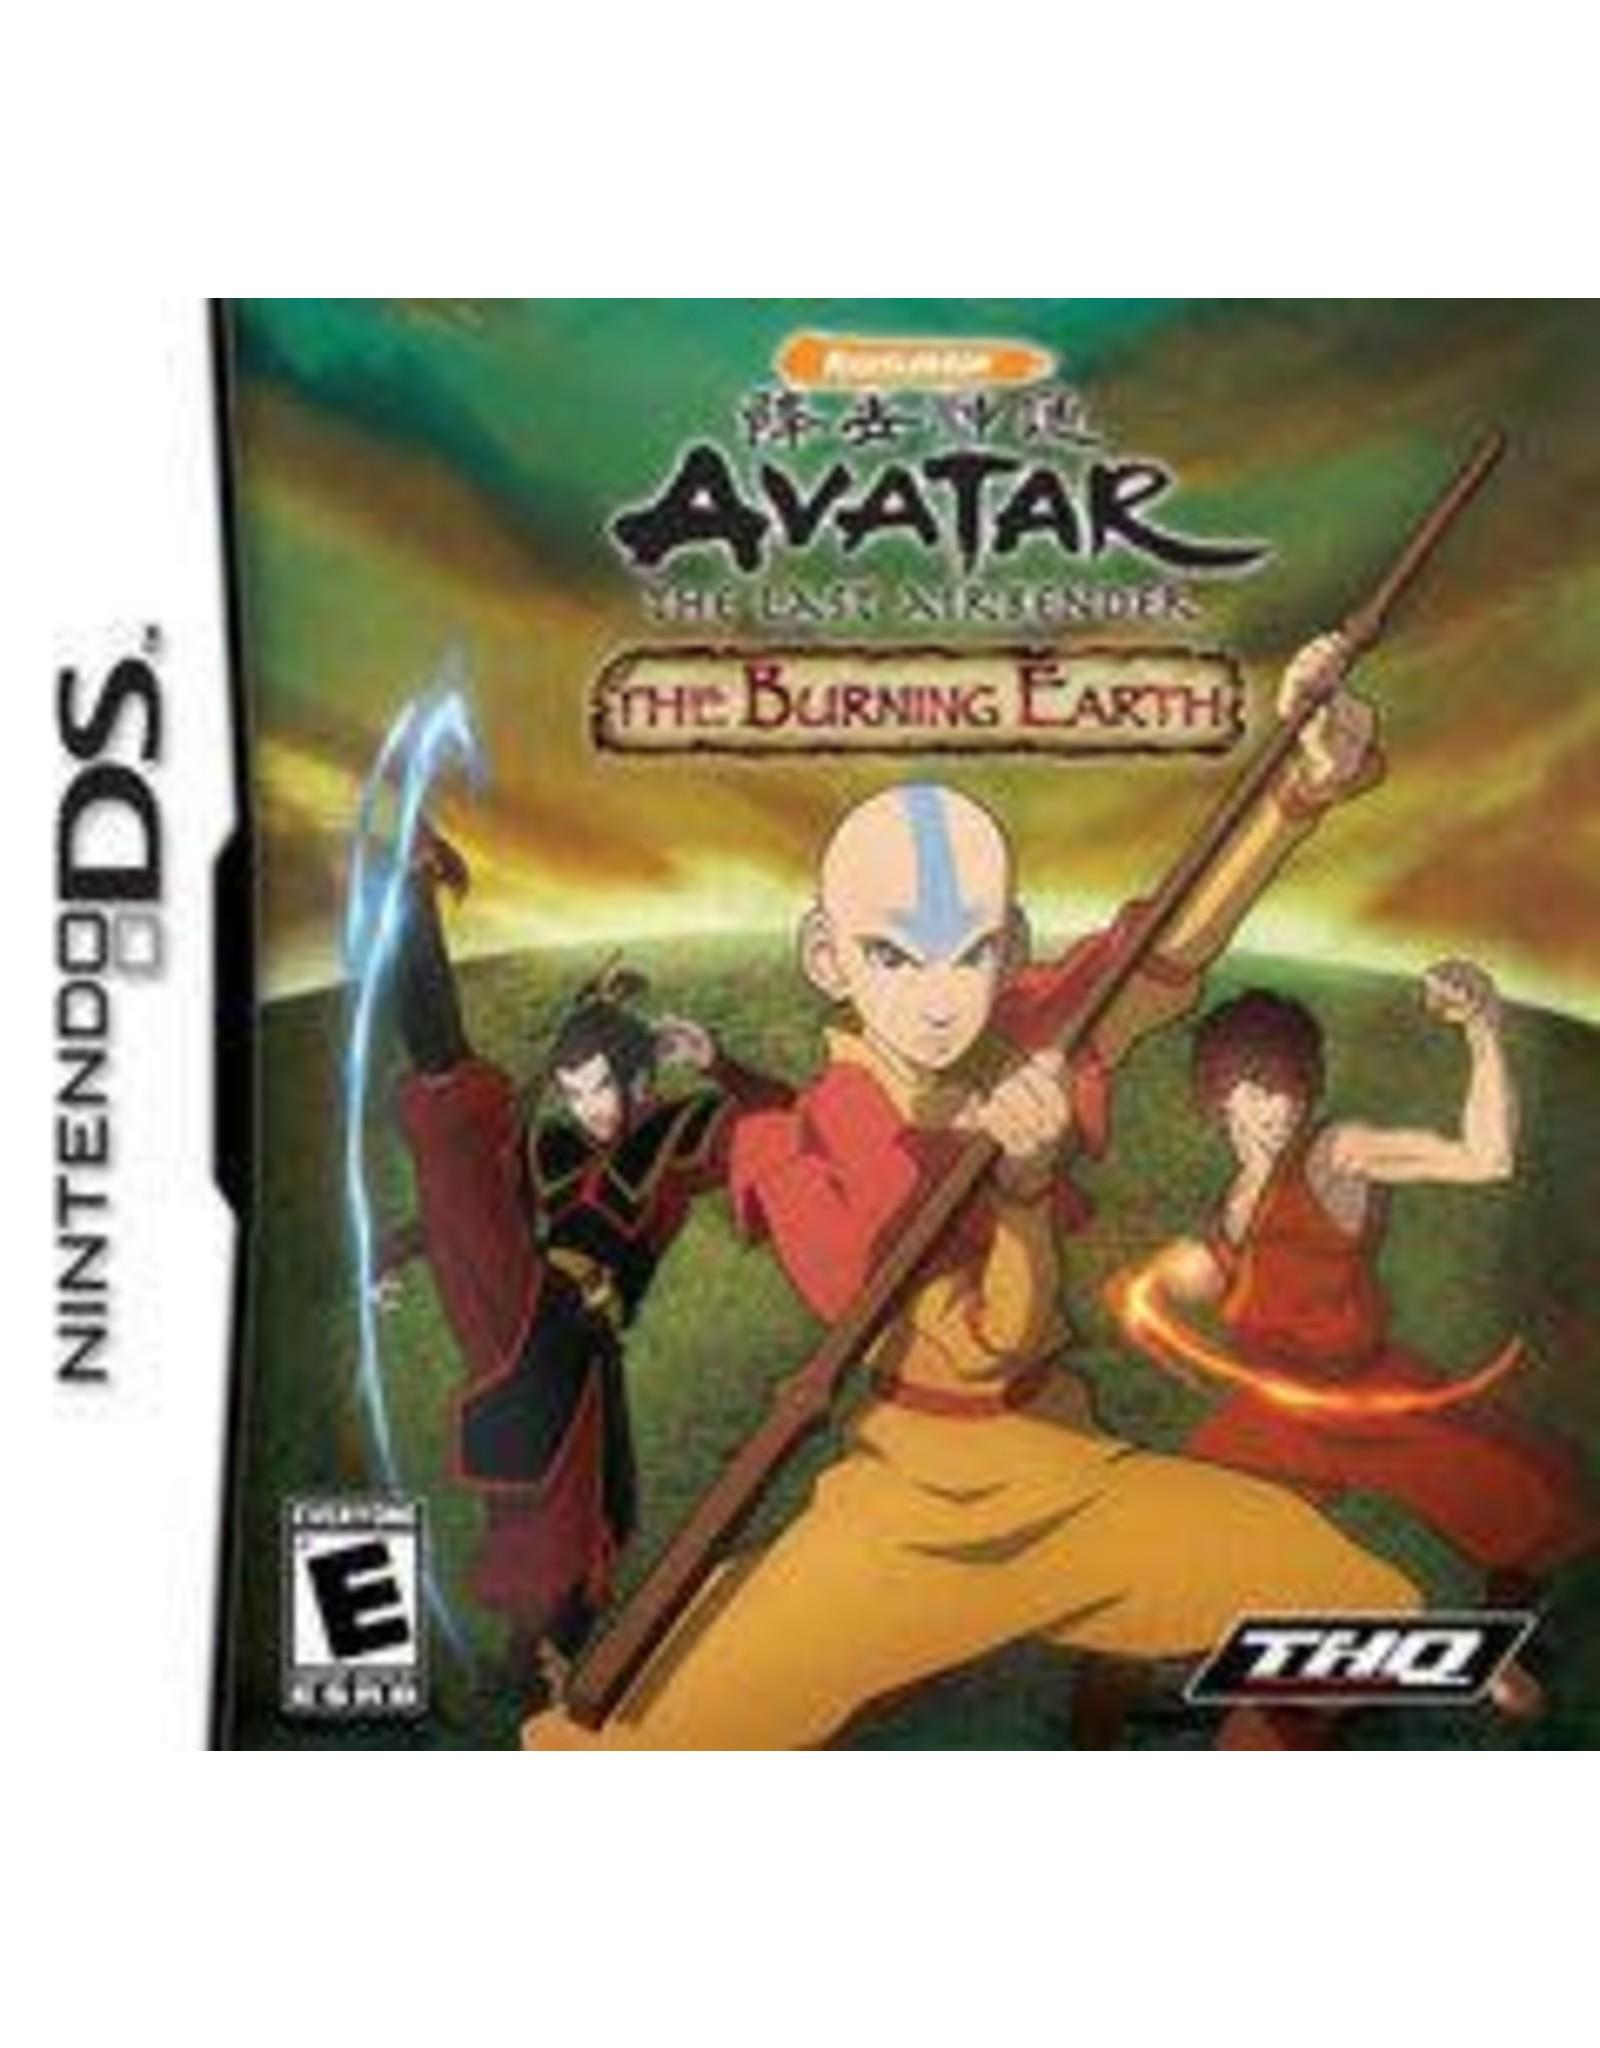 Nintendo DS Avatar The Burning Earth (CiB)